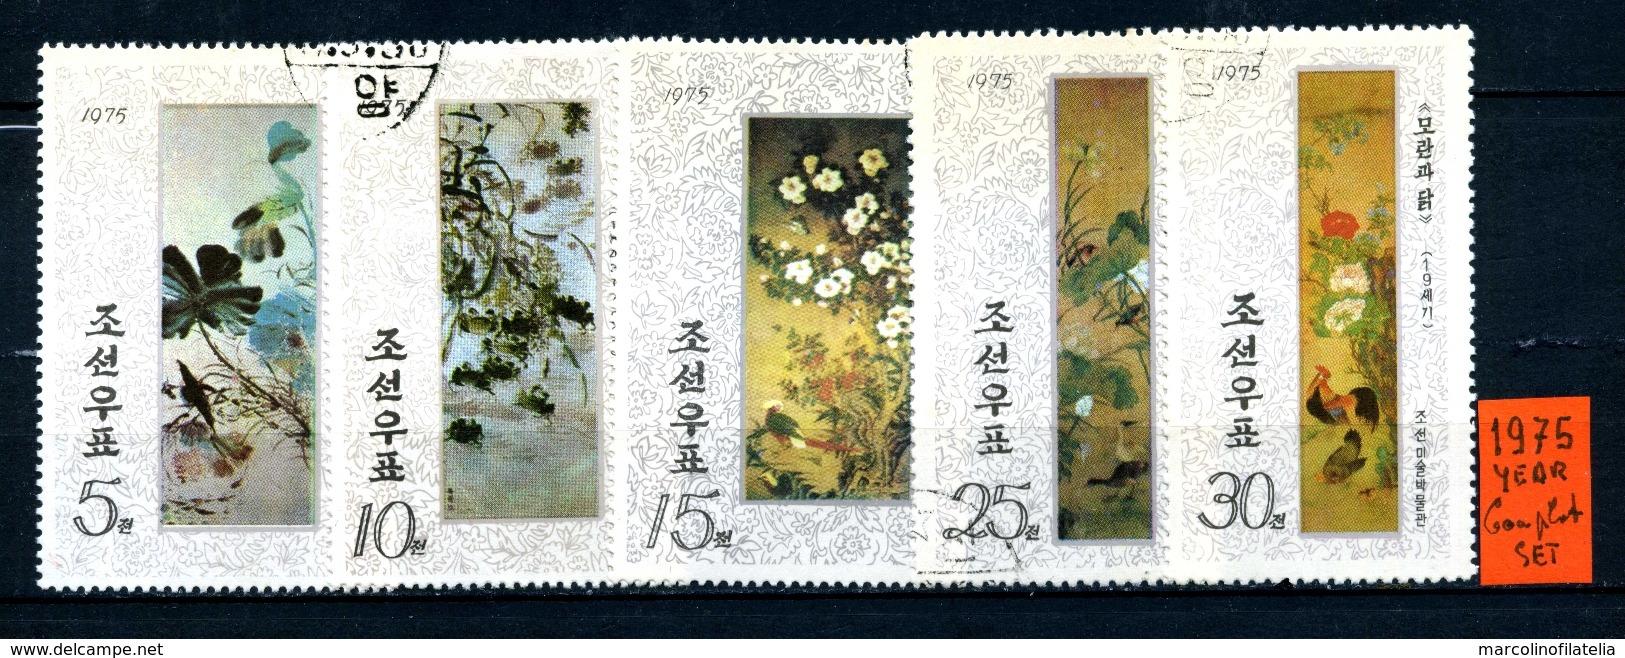 KOREA Del NORD - Year 1975 - COMPLET SET - Fiori - Flowers - Timbrati - Stamped. - Corea Del Nord